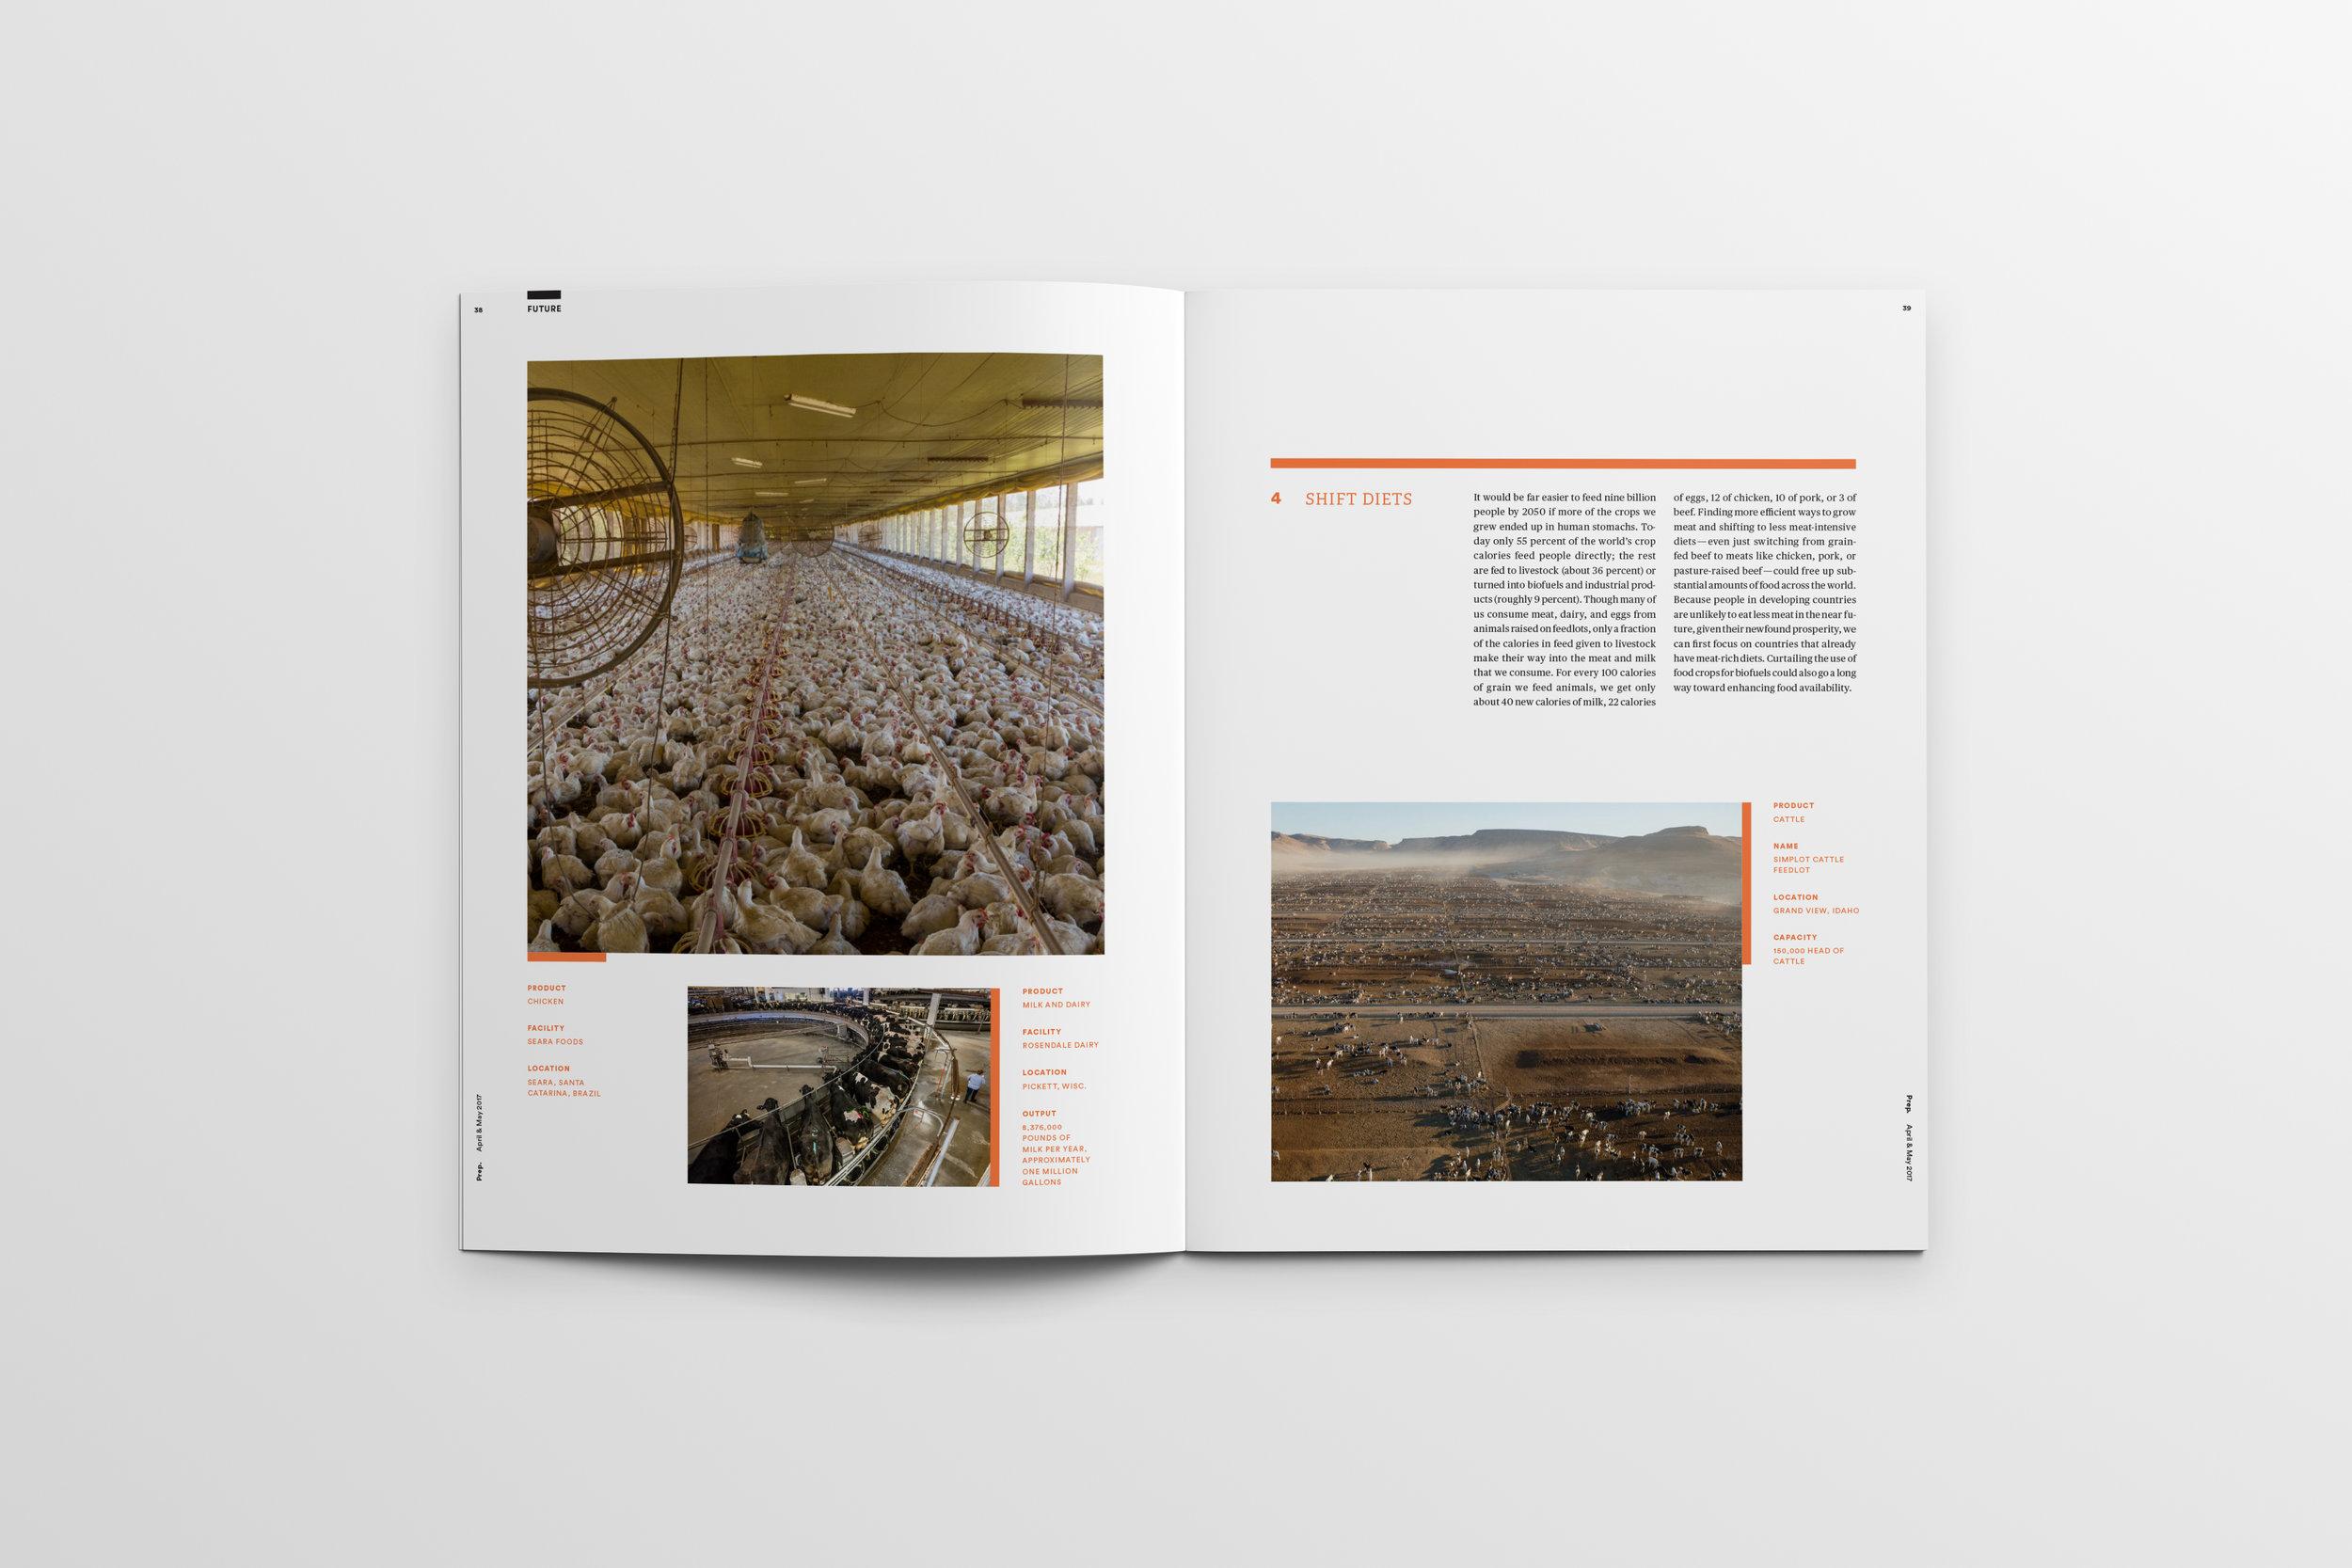 Magazine_Mockup_Pages38-39.jpg